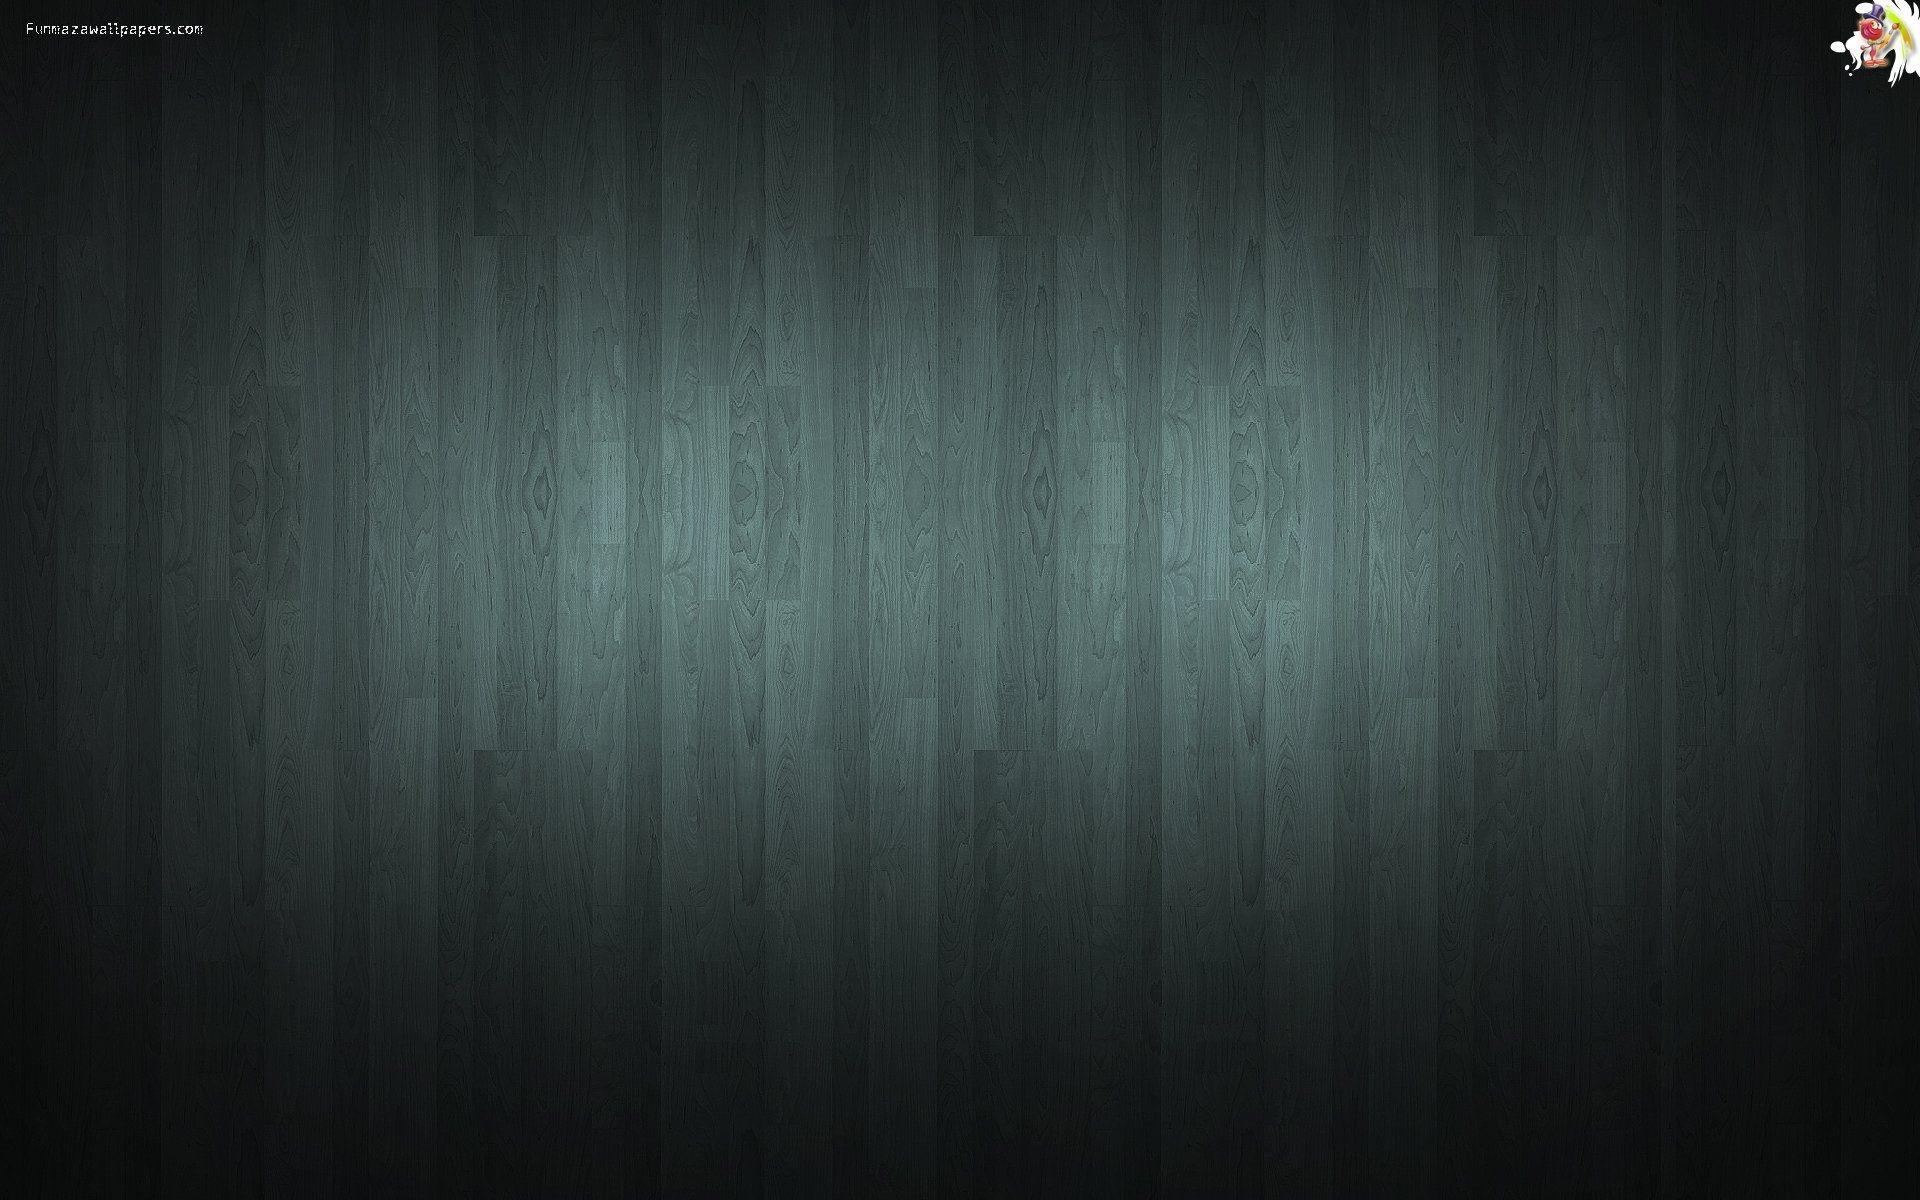 Res: 1920x1200, September 3, 2017, Blank Wallpaper 4K Ultra HD - for PC & Mac, Tablet,  Laptop, Mobile